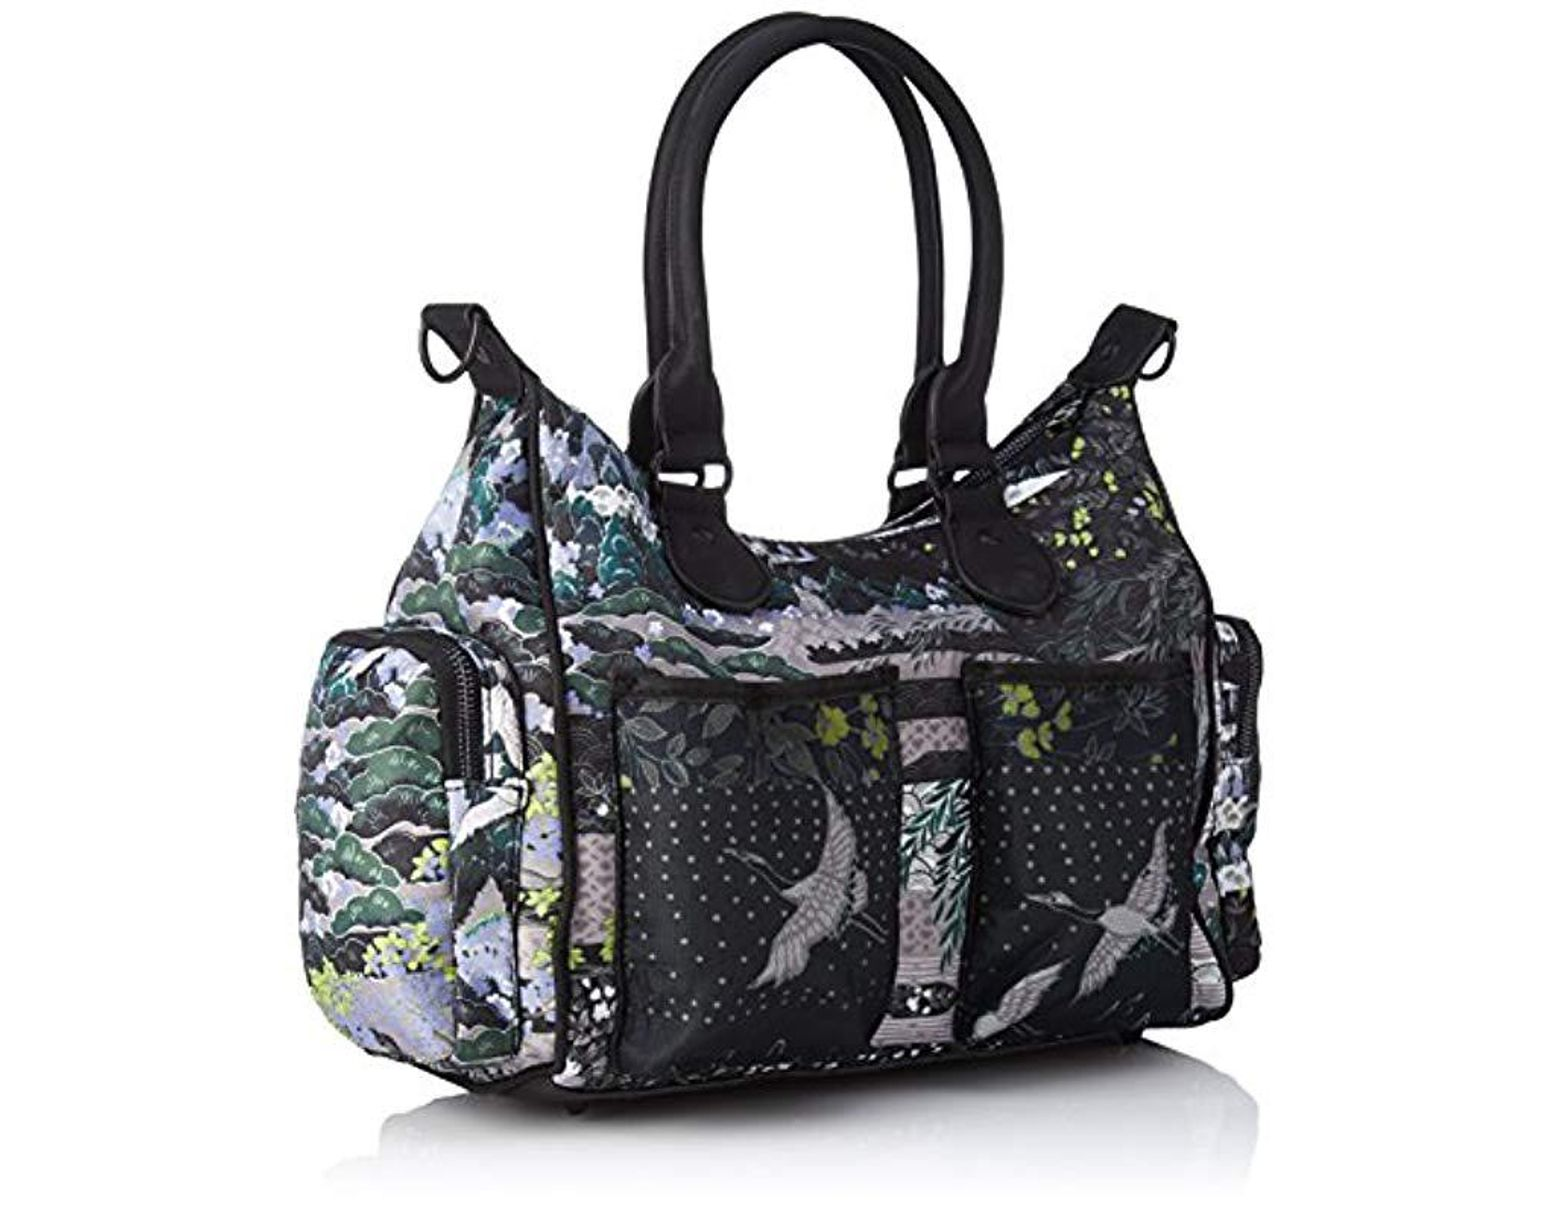 4b063a41910 Desigual Explorer London Medium Handbag 32 Cm - Lyst